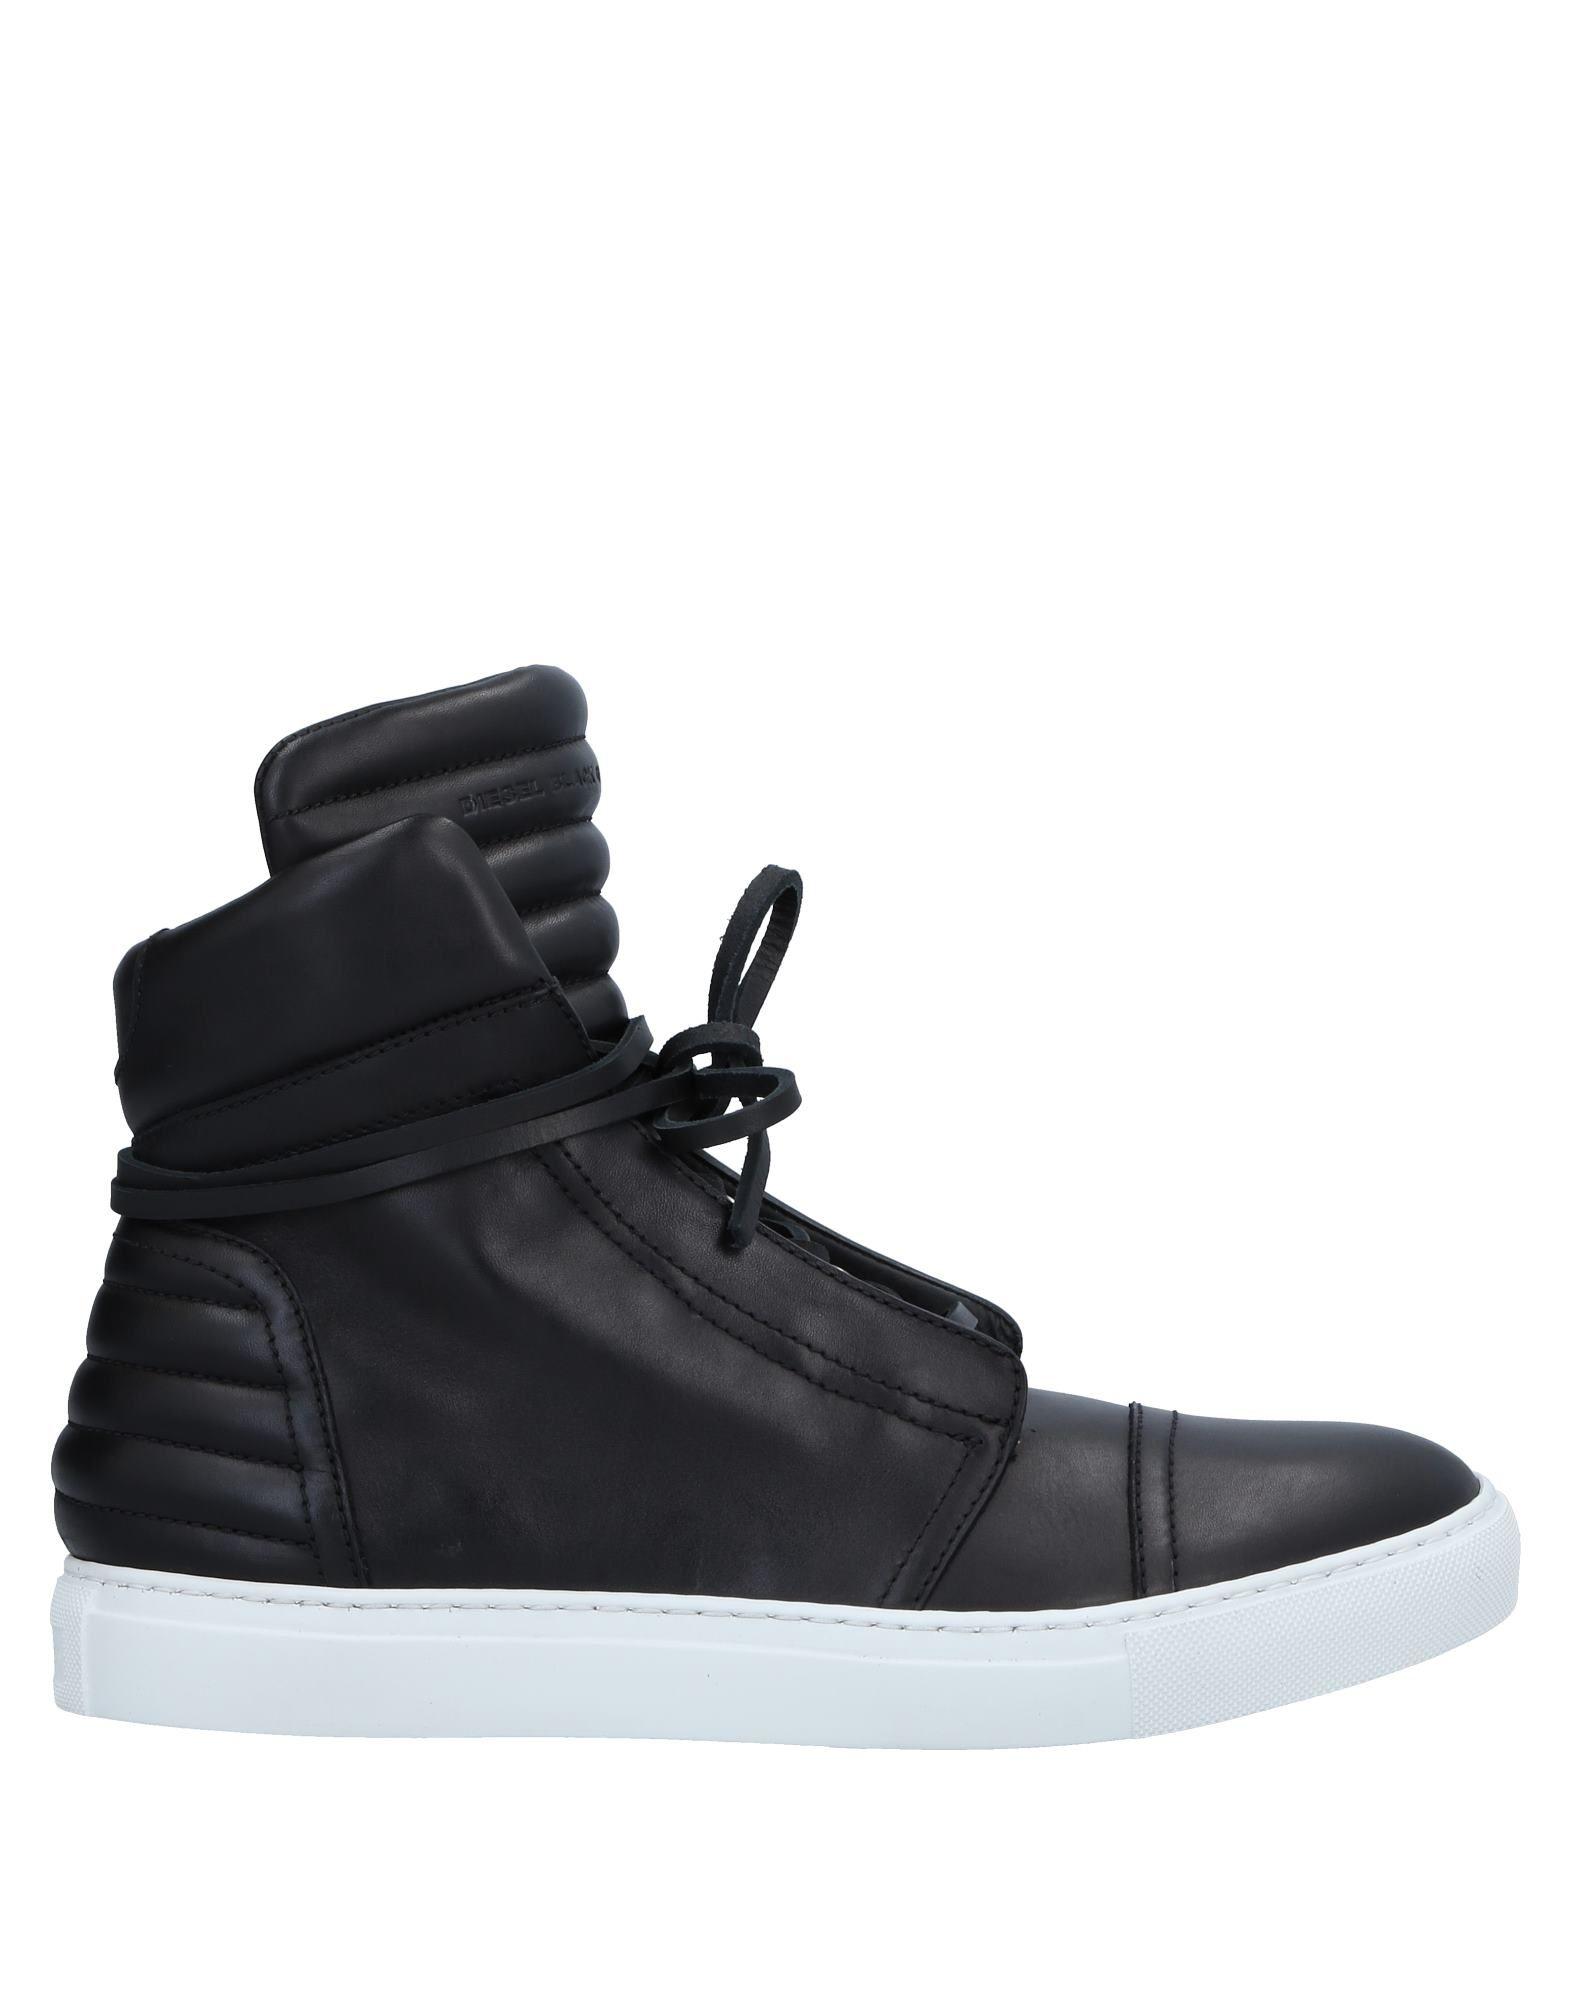 Diesel Black Gold Sneakers Herren  11532724PK Neue Schuhe